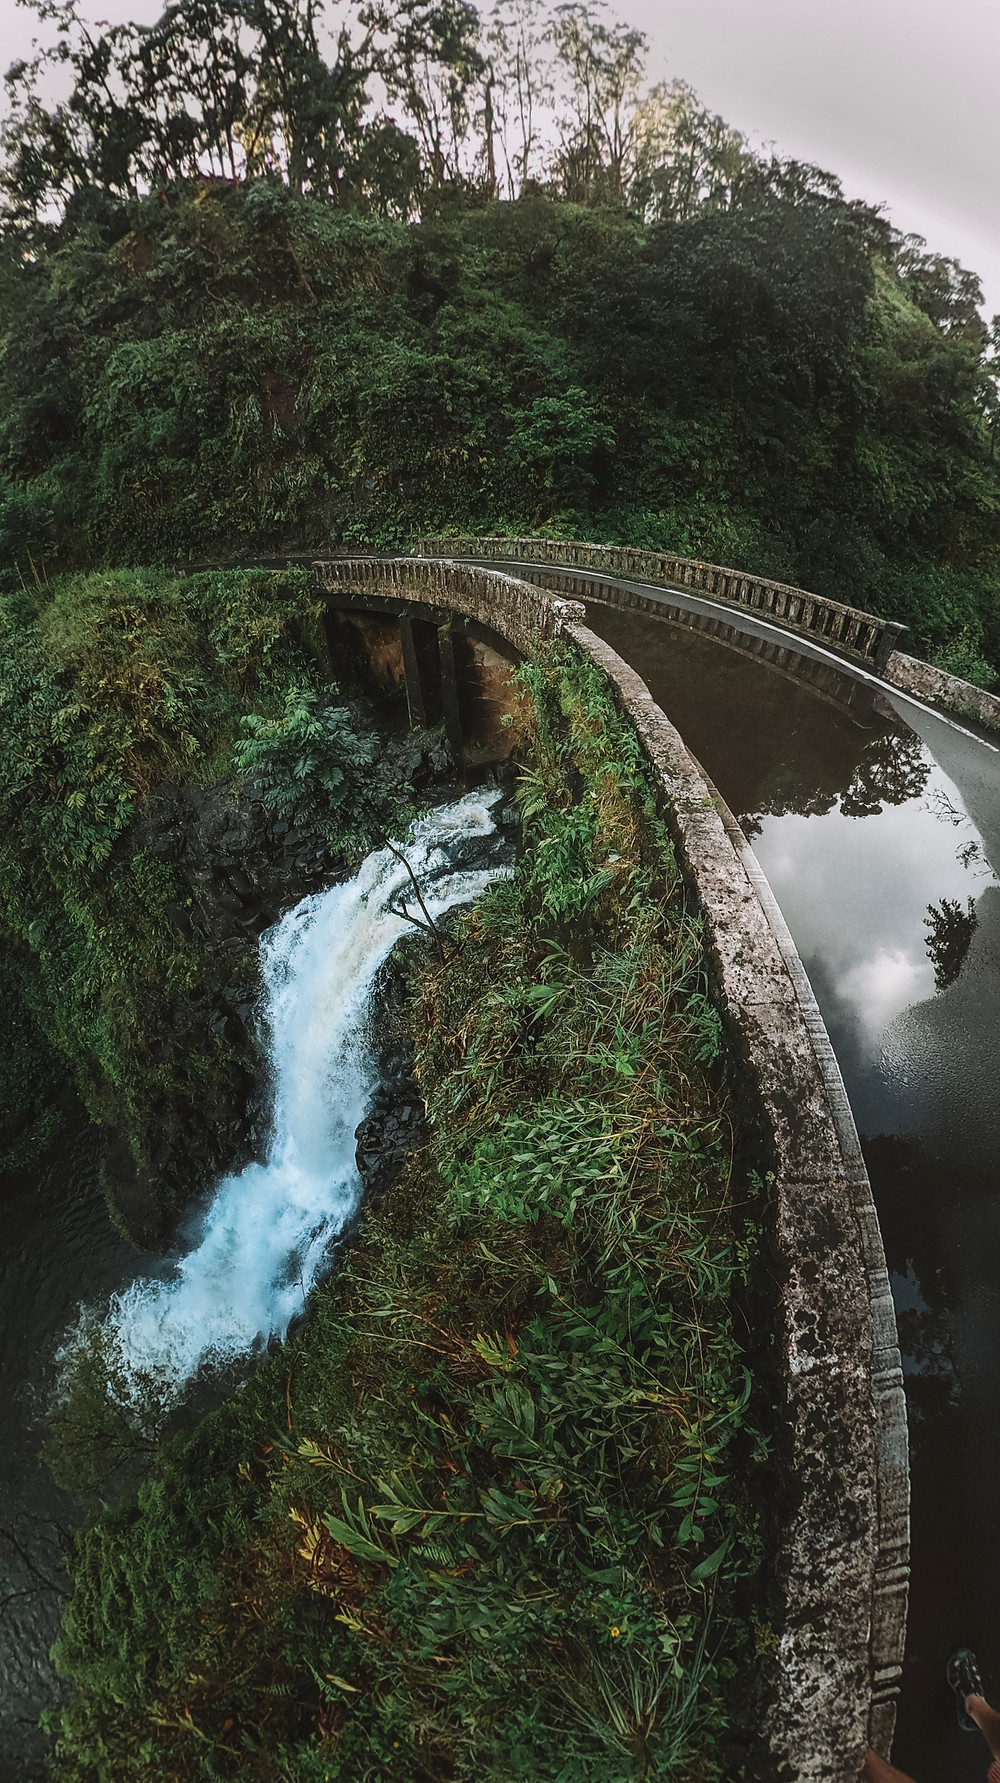 Bridge over a waterfall in the Maui Jungle